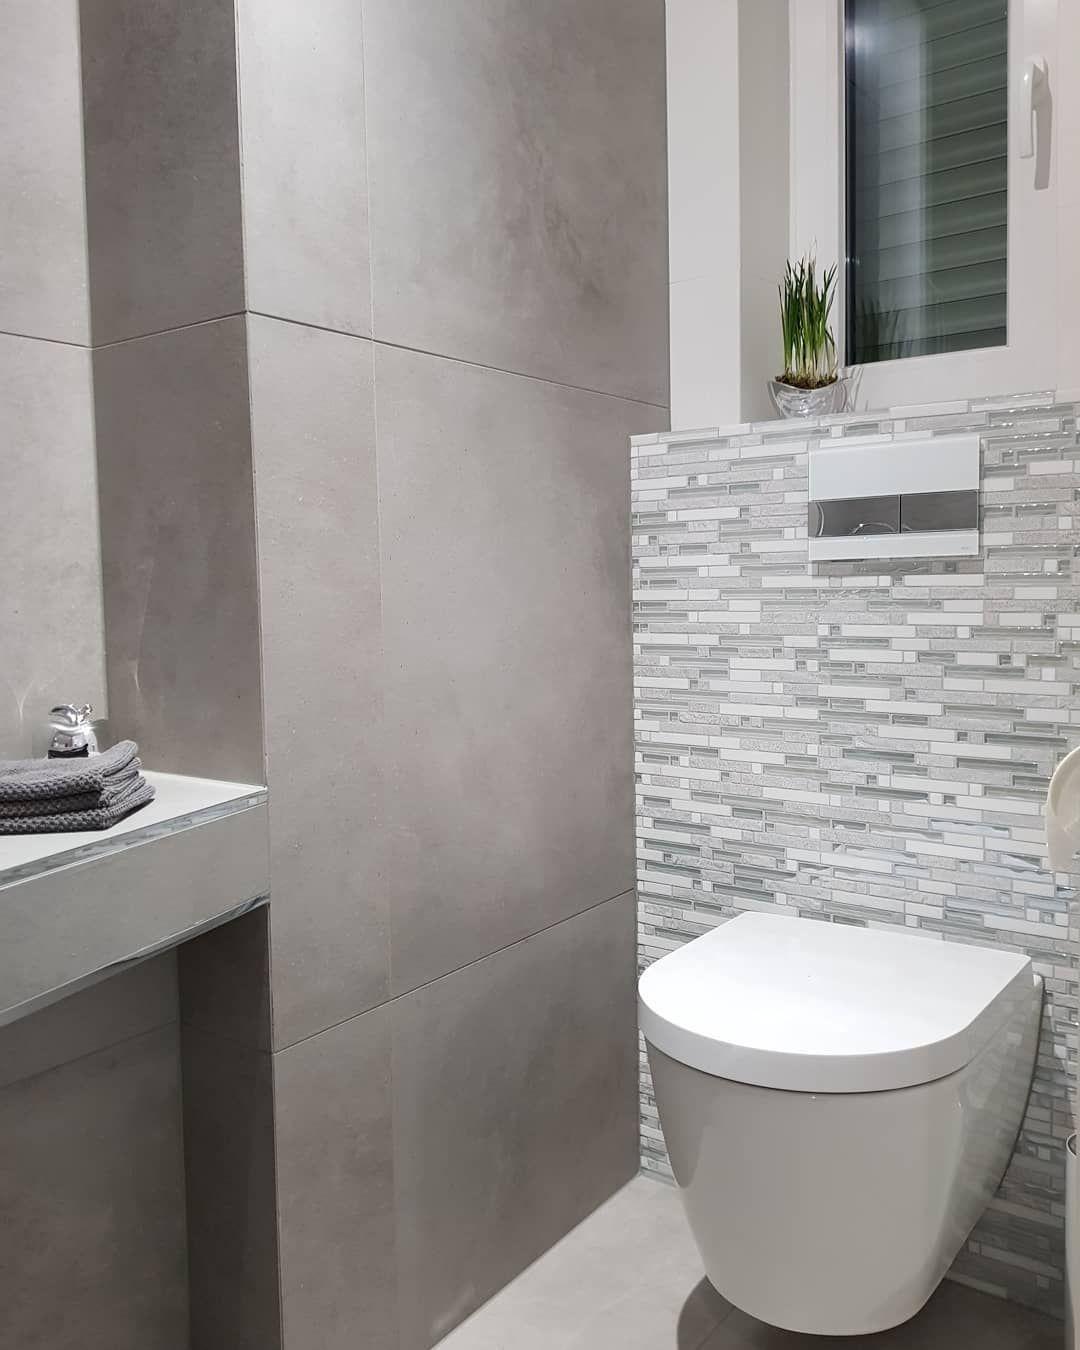 Izabela Kostka On Instagram Toaleta Wc Gastewc Hausbau Homesweethome Homeinspiration Homedecor Kafe In 2020 Badezimmer Mosaik Mosaik Fliesen Bad Bad Mosaik